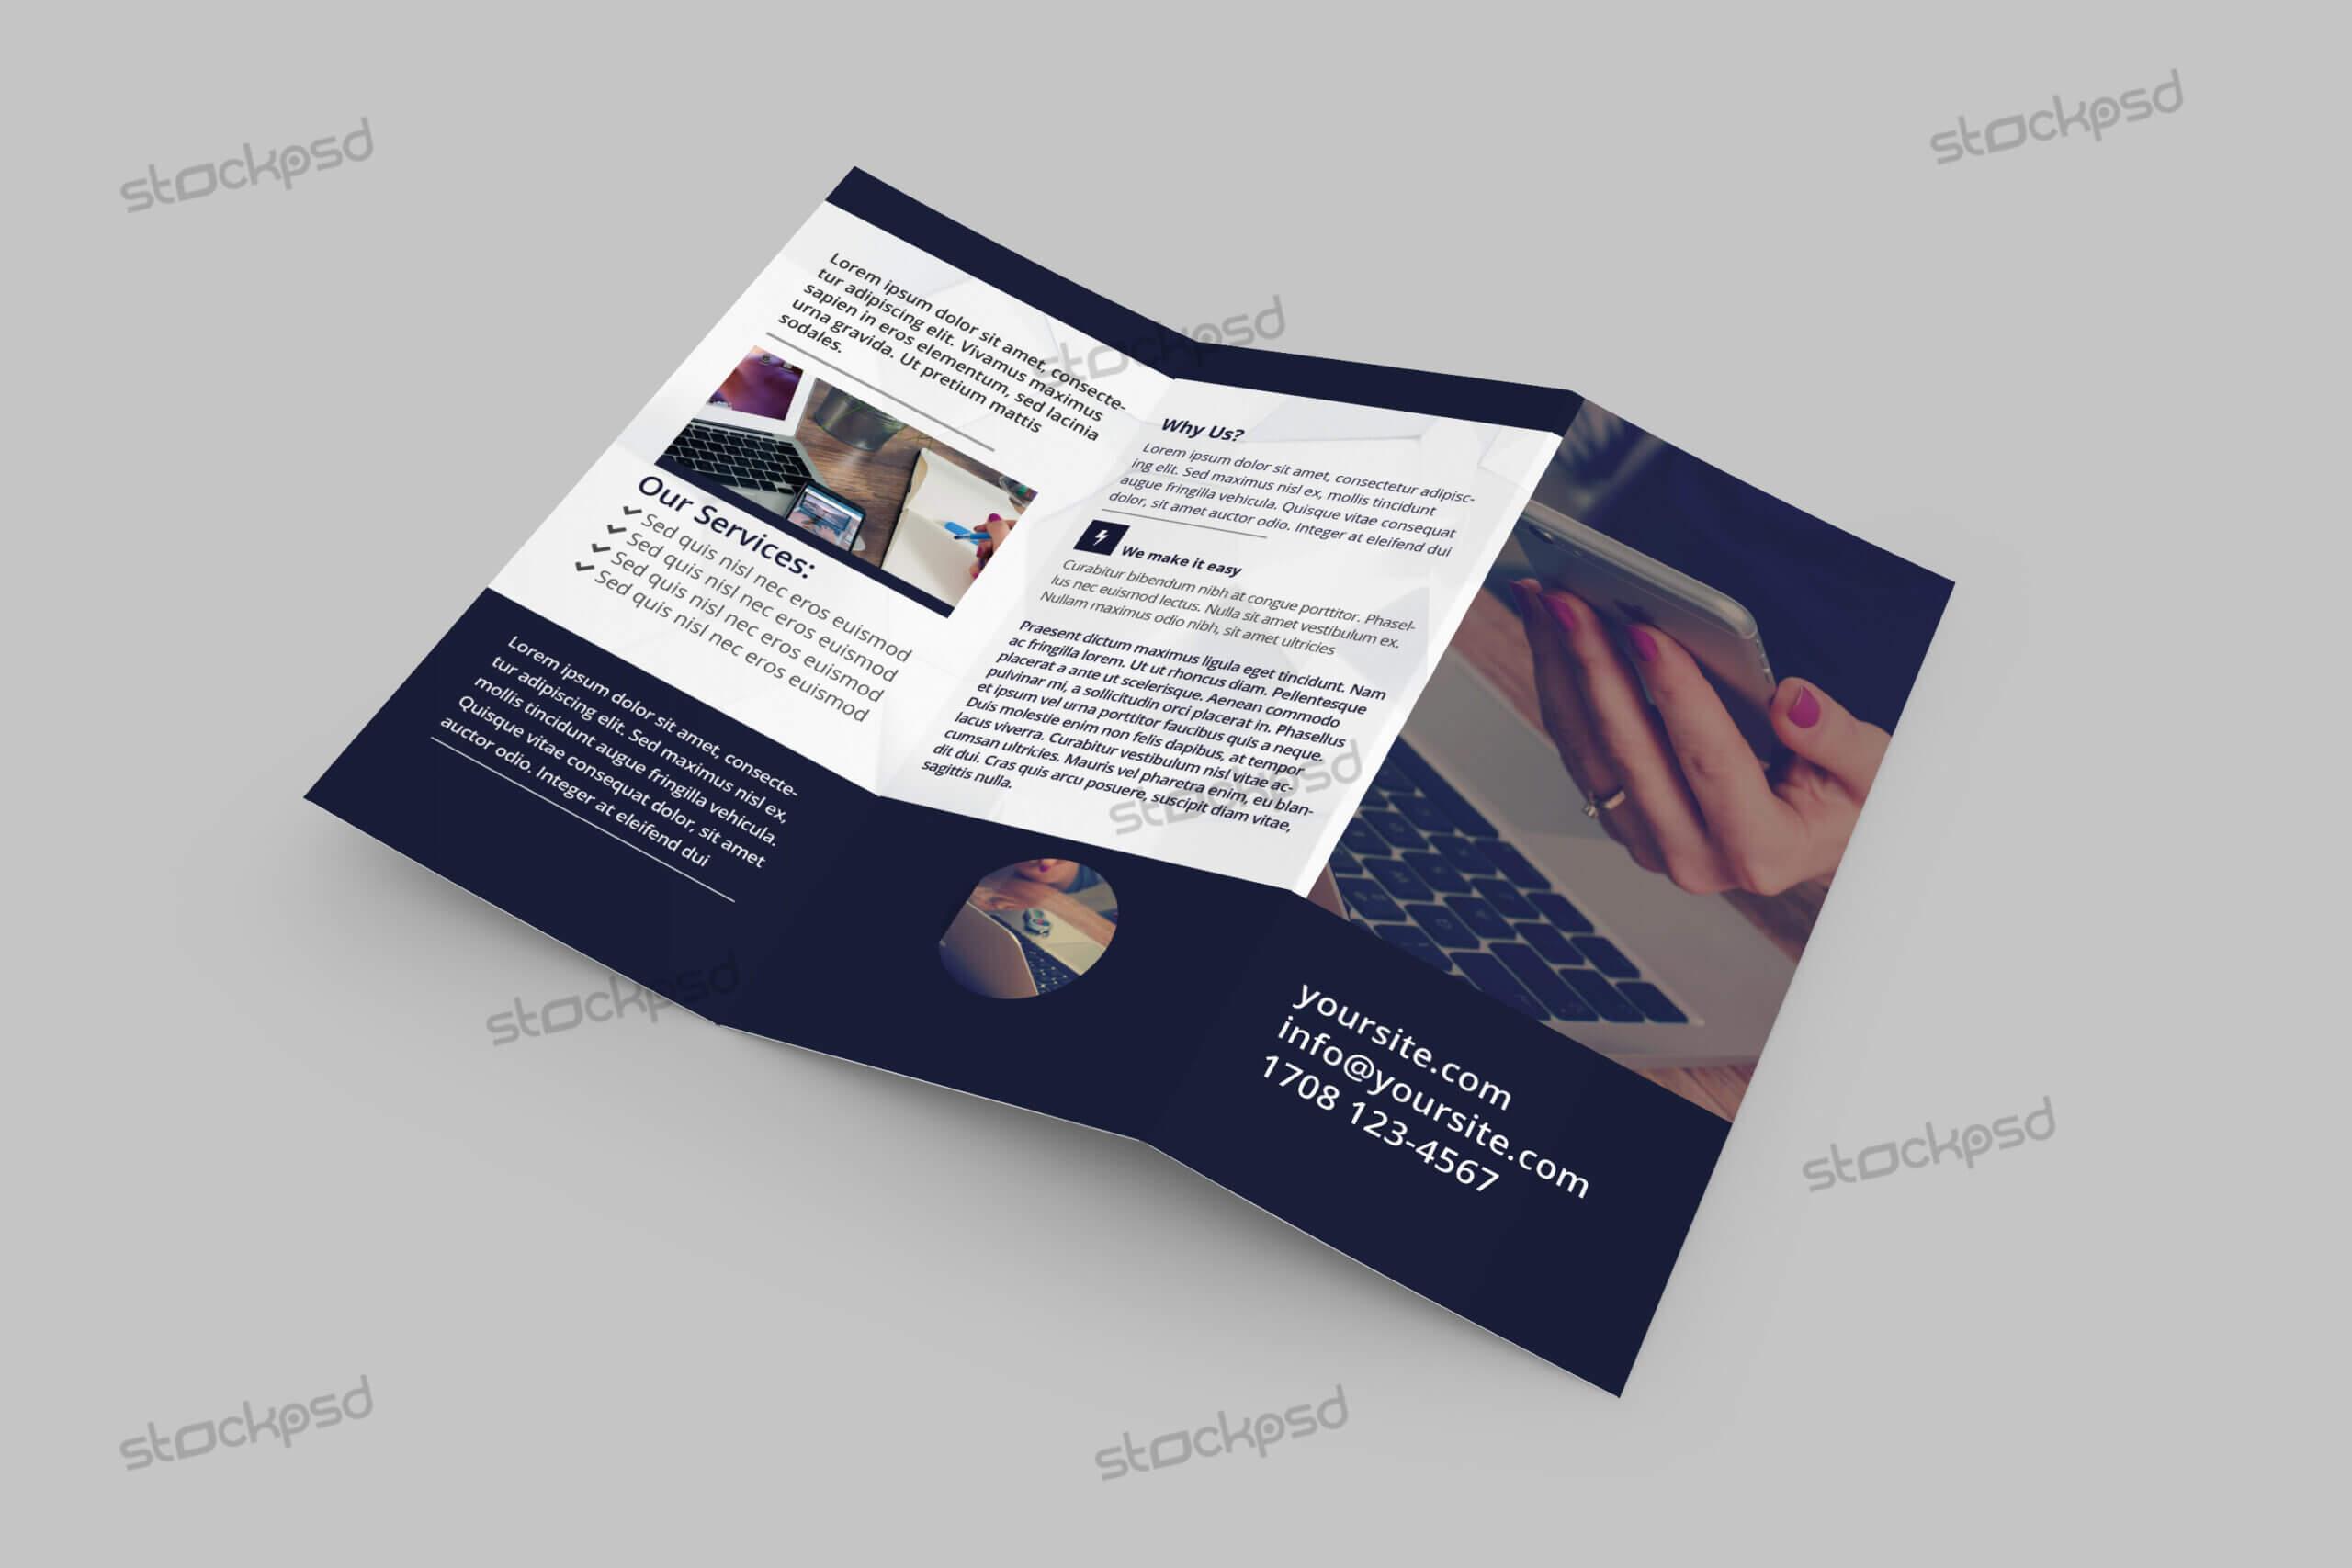 Tri Fold Corporate Brochure – Free Psd Template – Free Psd Pertaining To Brochure Psd Template 3 Fold